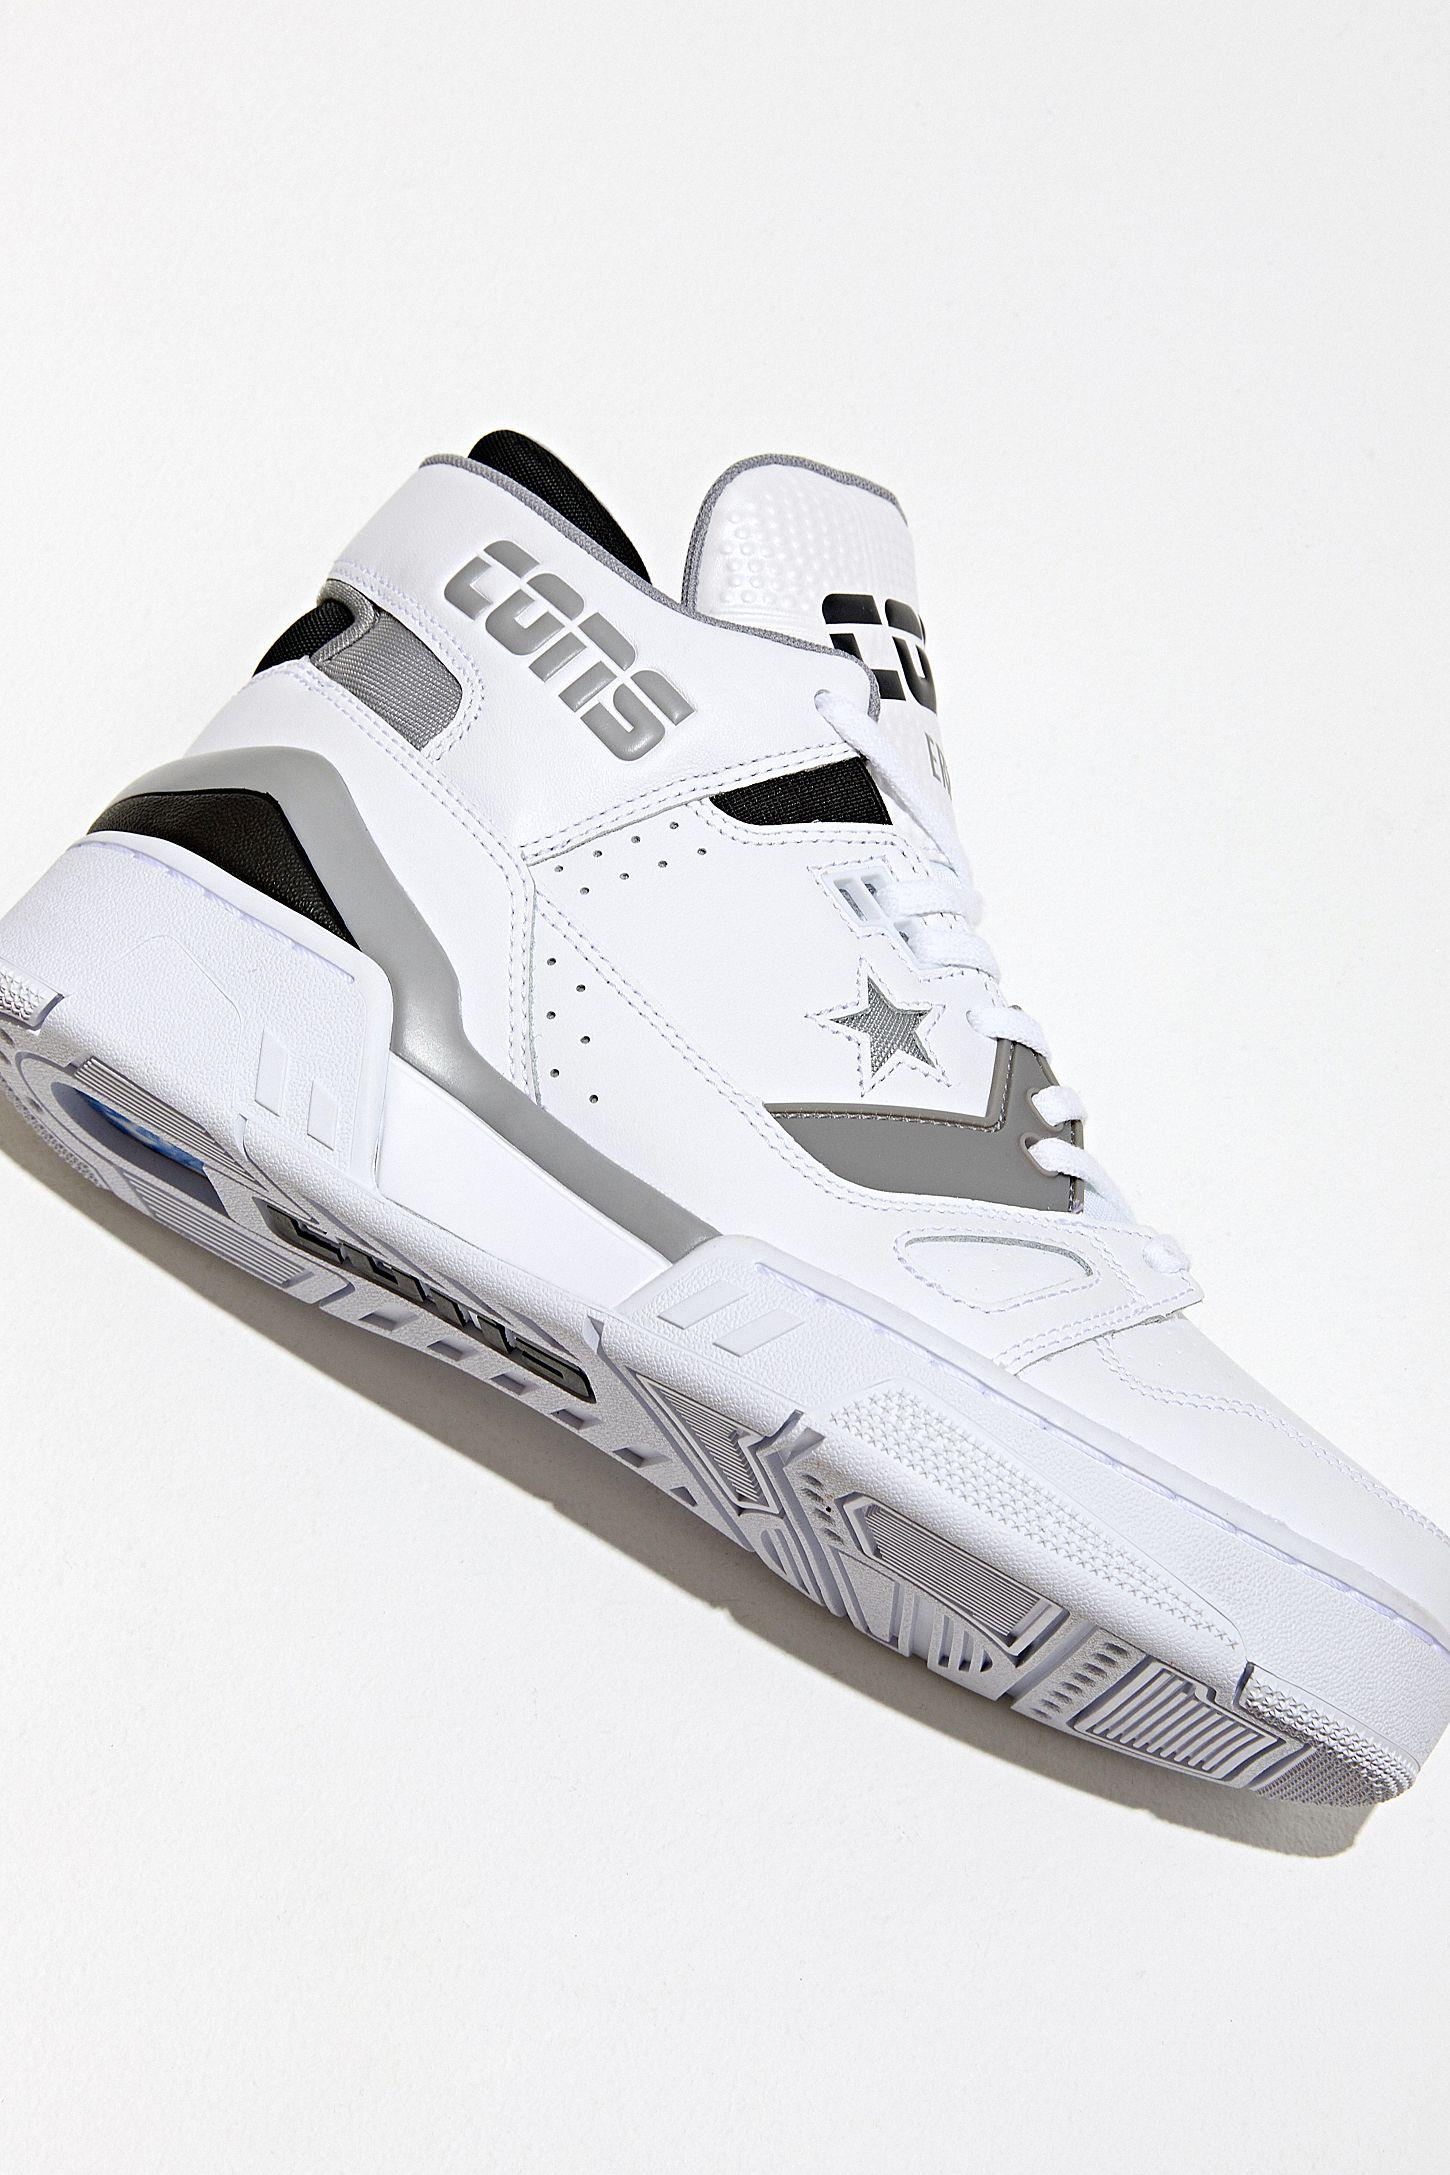 Converse ERX 260 Mid Sneaker